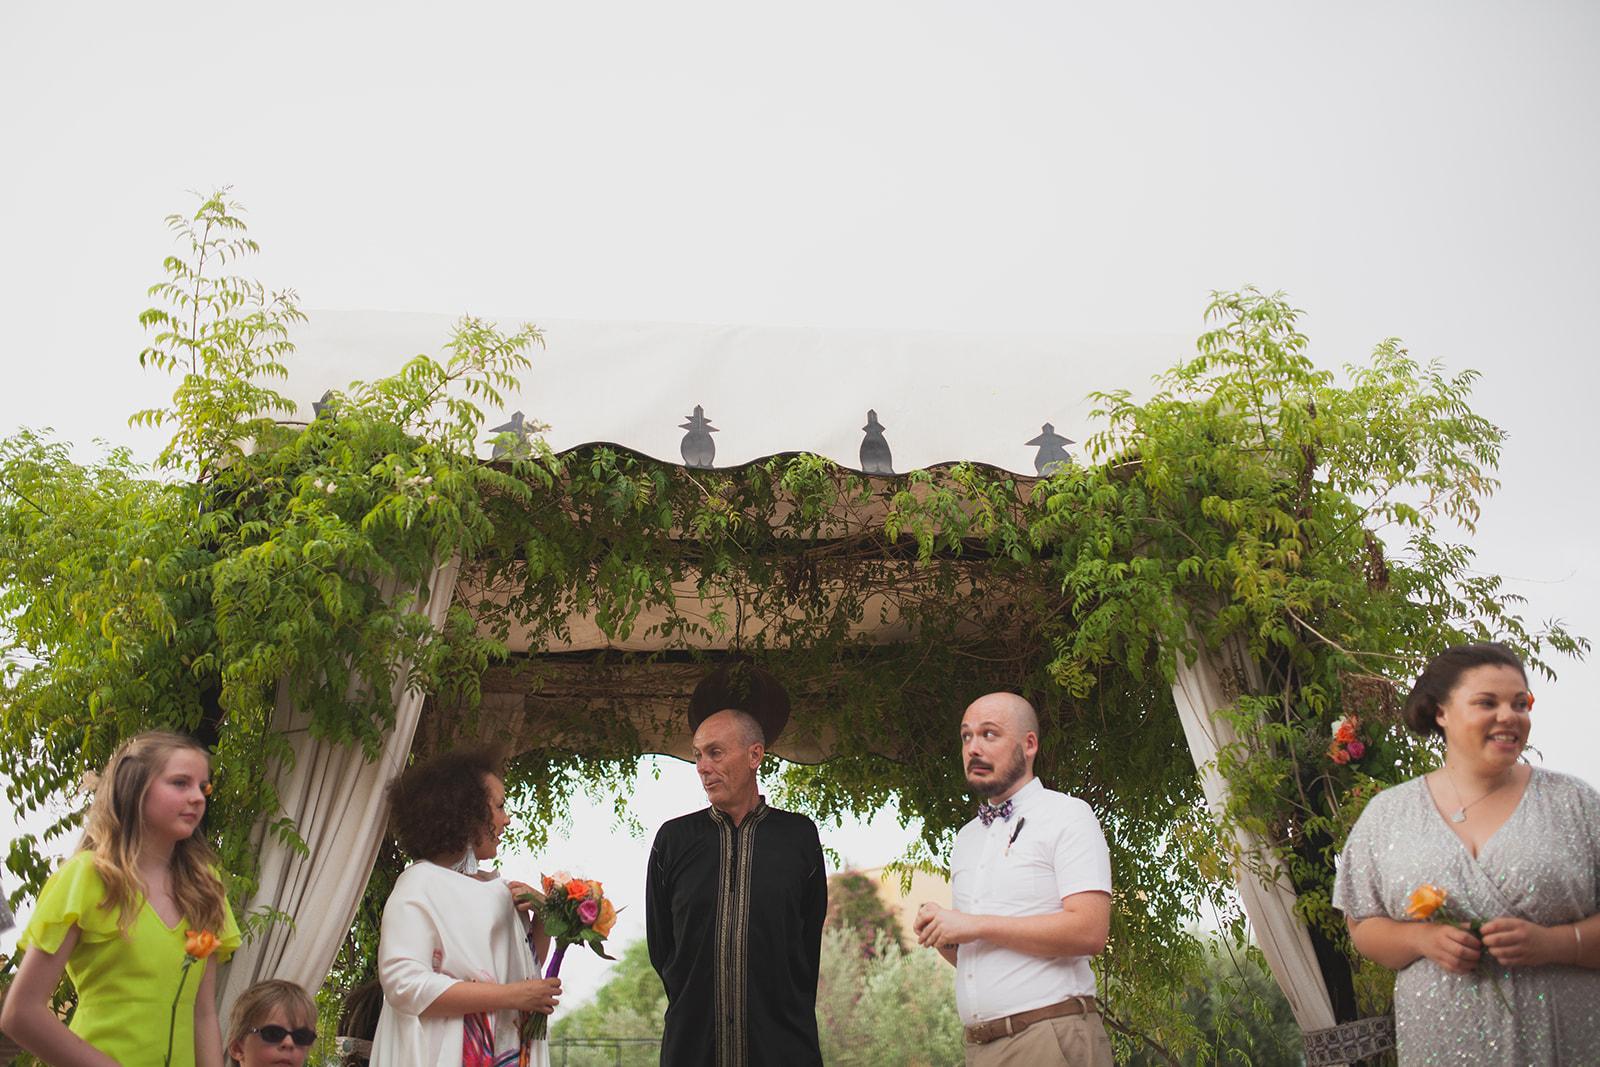 a groom looks nervous during the wedding ceremony. fawakay villas marrakech wedding morrocco wedding photography. stop motion wedding films uk